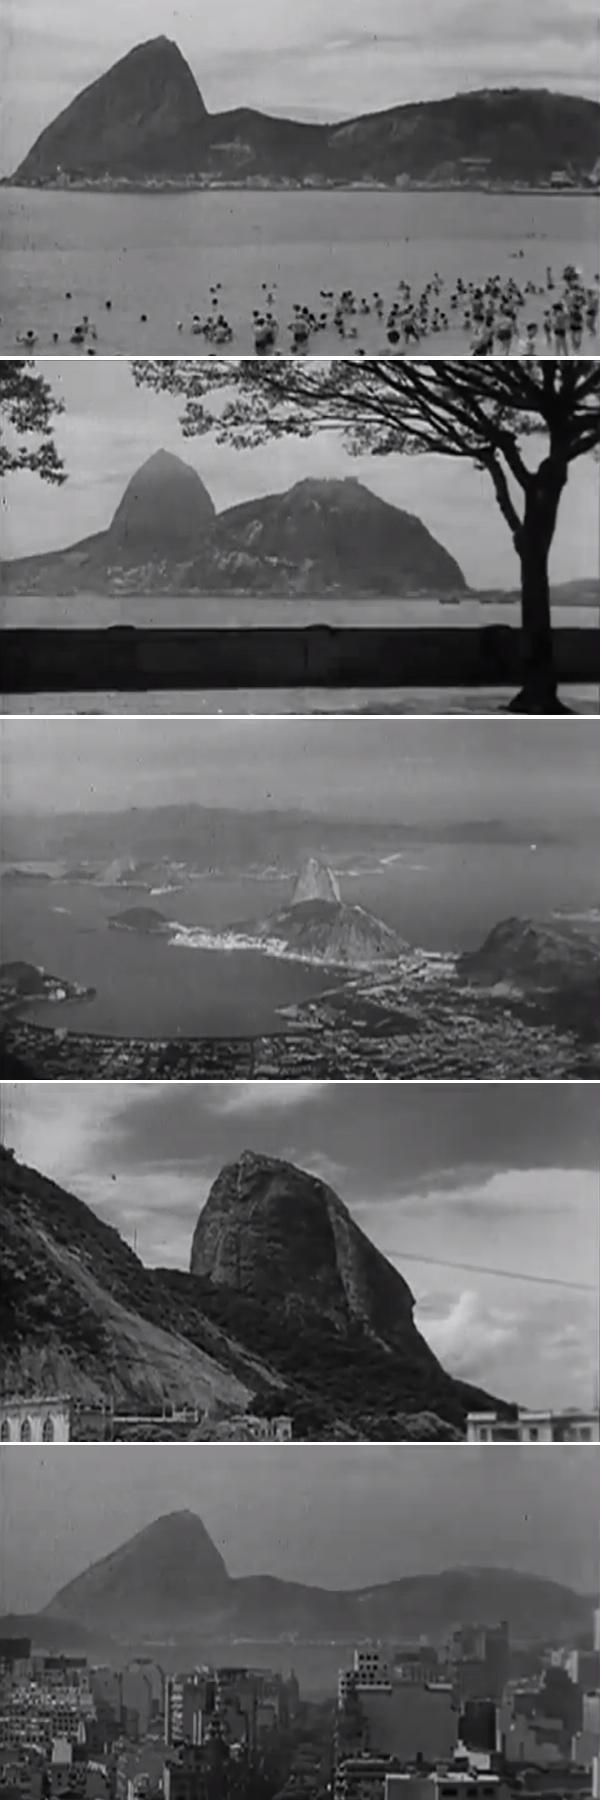 Fotogramas do filme The Screen Traveller sobre o Rio de Janeiro